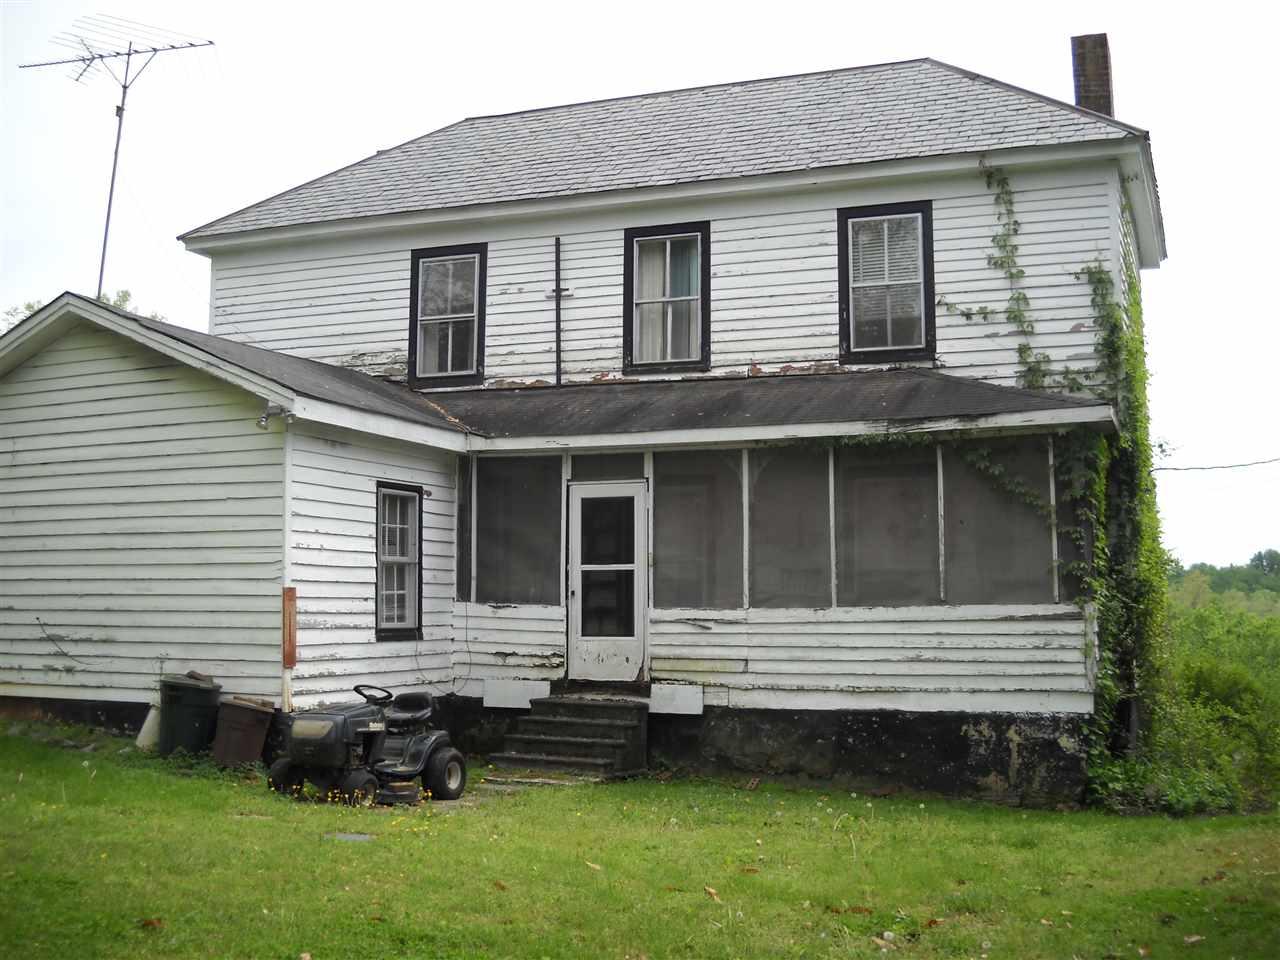 87 Cameron St, Columbia, VA, 23038